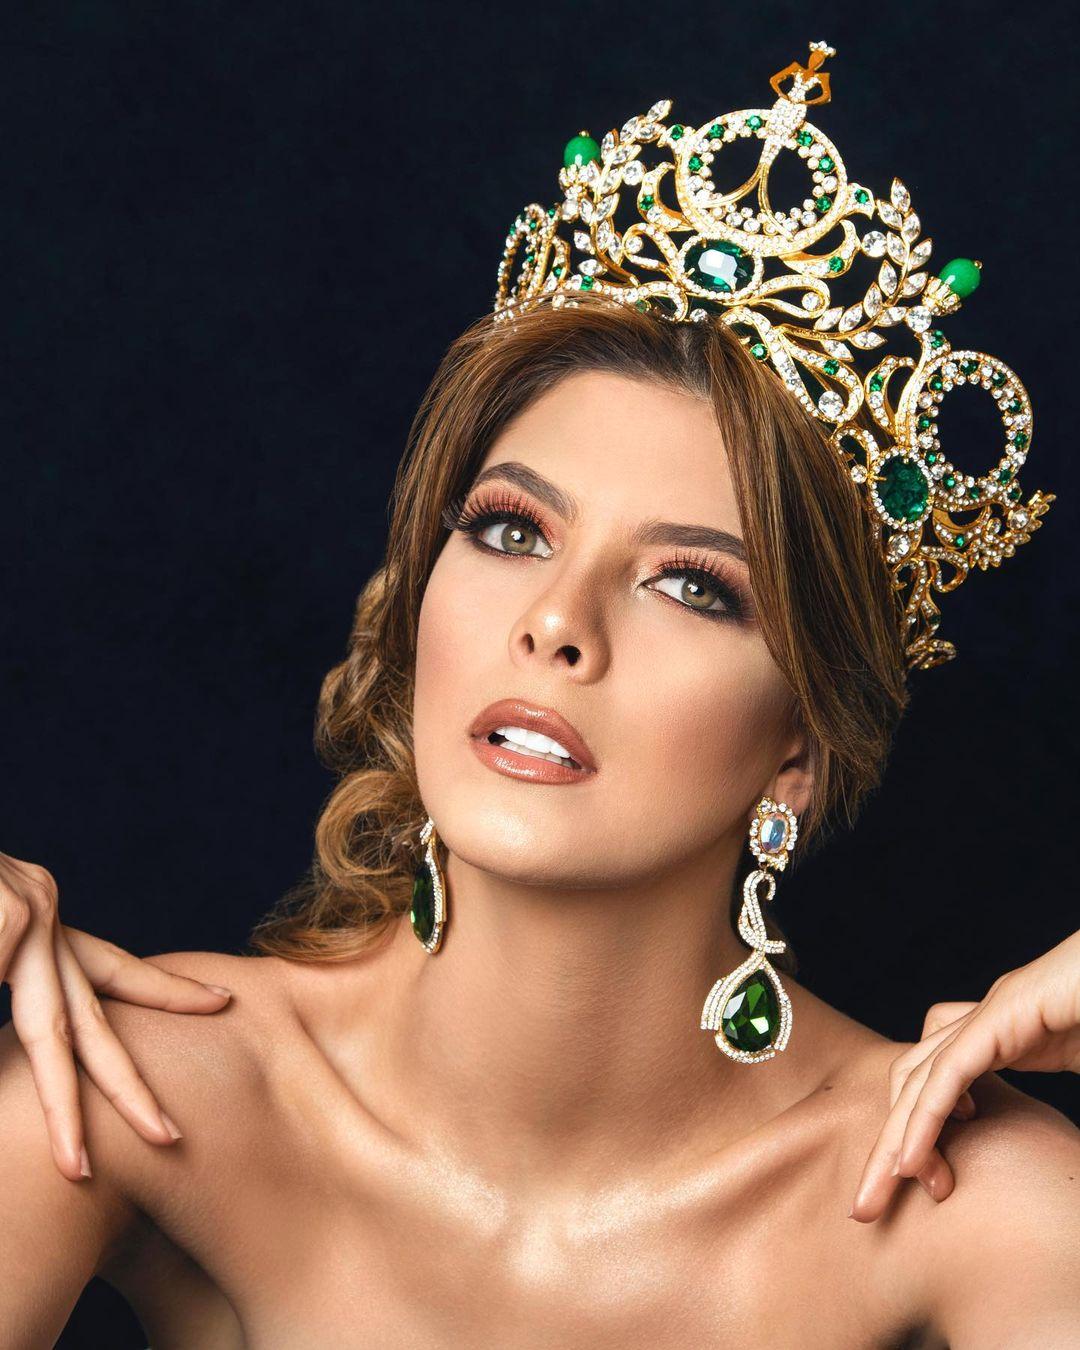 natalia manrique, miss grand colombia 2020. - Página 3 Ye7hl10